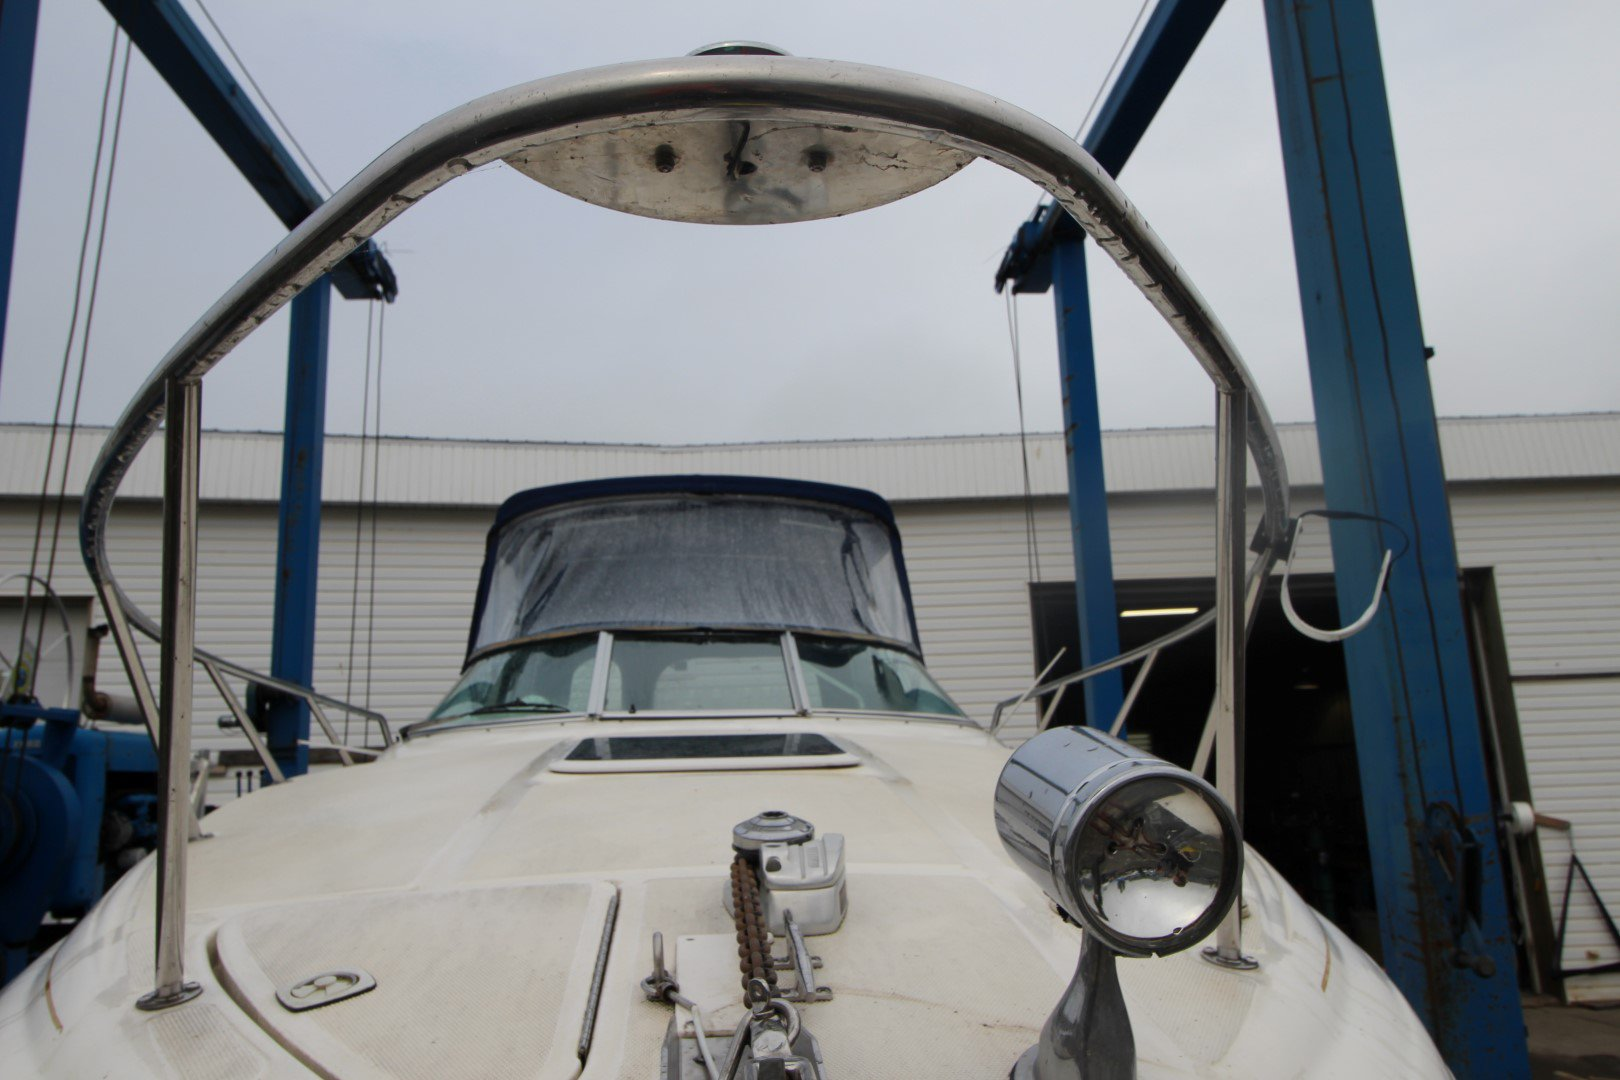 Sea Ray SunDancer 260 - IMG_2302